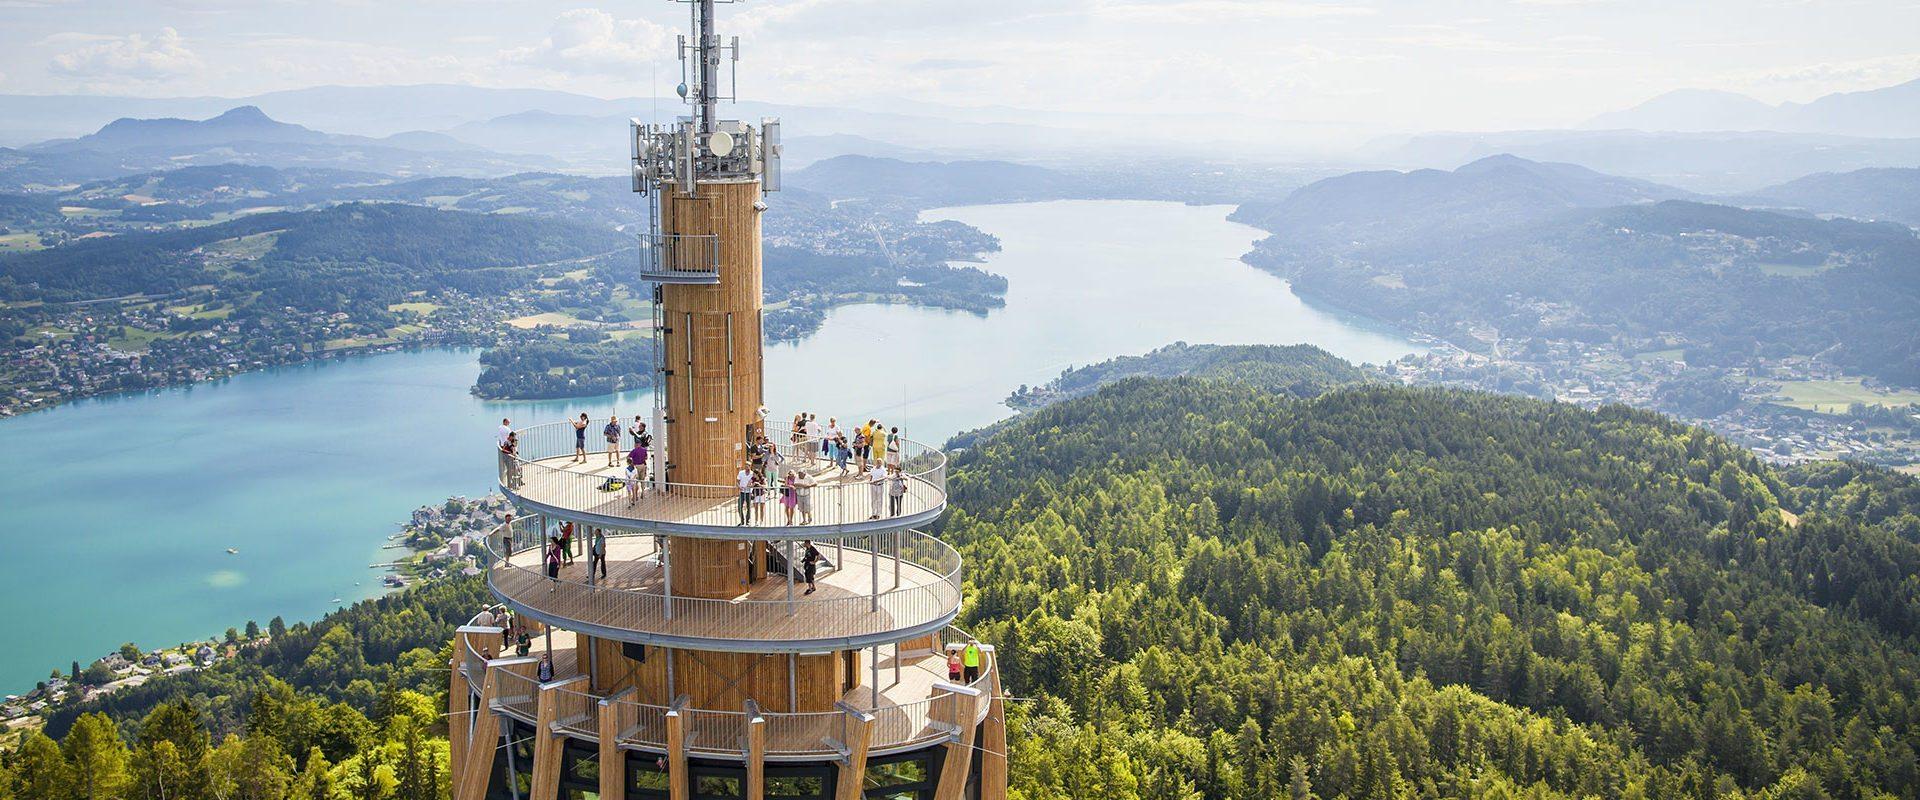 Ausflugsziele - Pyramidenkogel, Kärnten